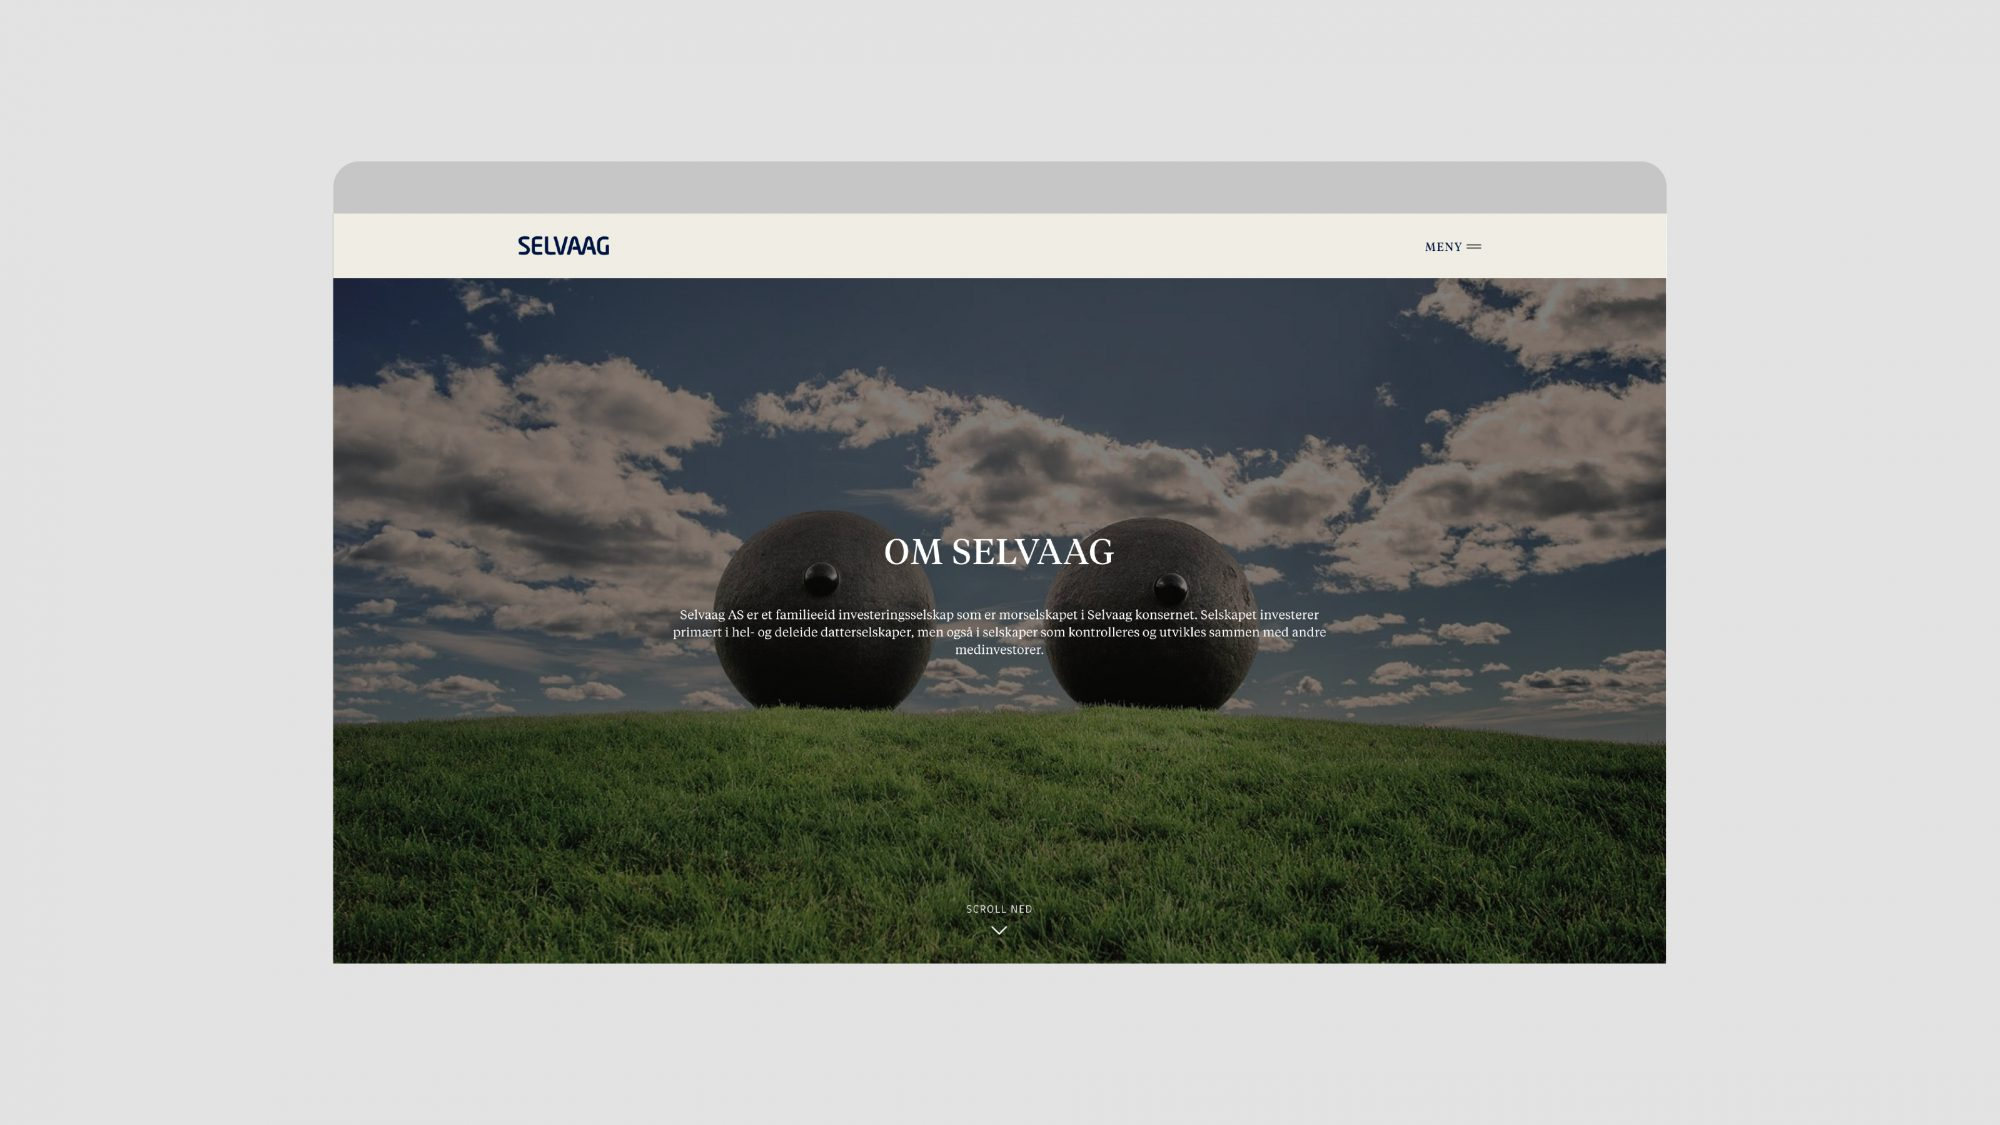 Selvaag_3840x21602-1